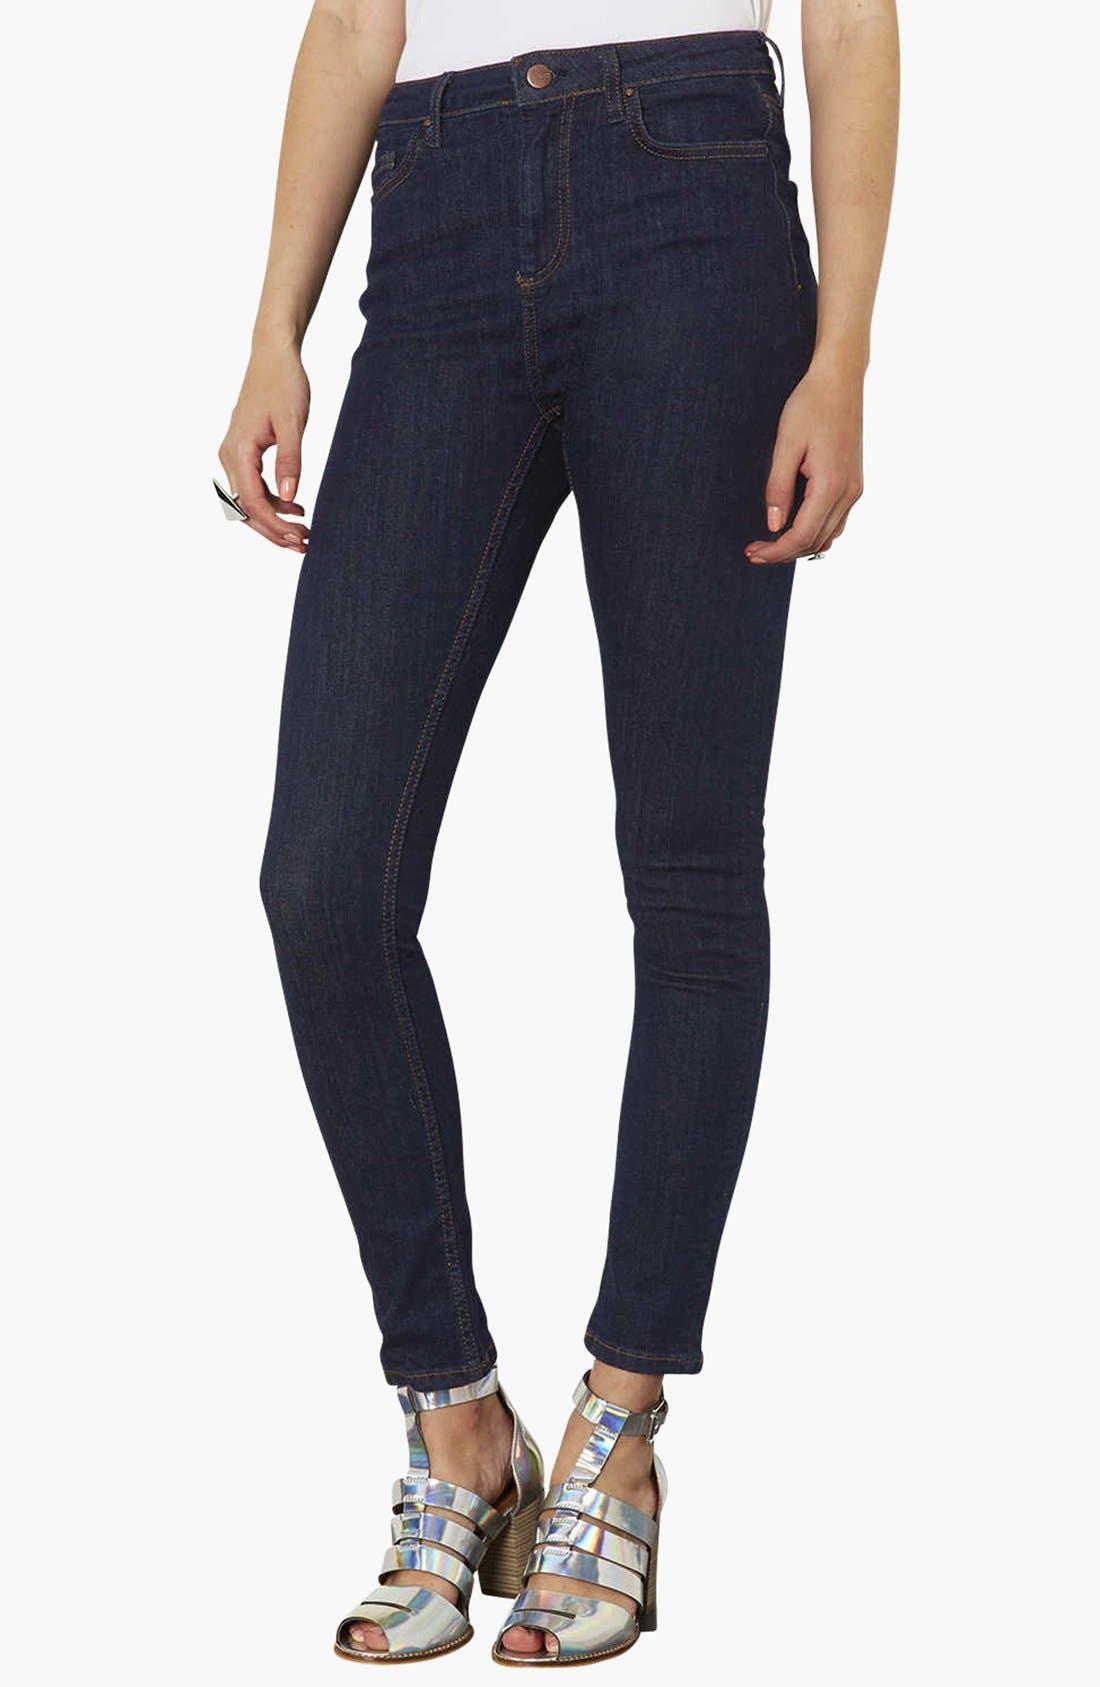 Alternate Image 1 Selected - Topshop Moto 'Jamie' High Rise Skinny Jeans (Blue) (Regular, Short & Long)